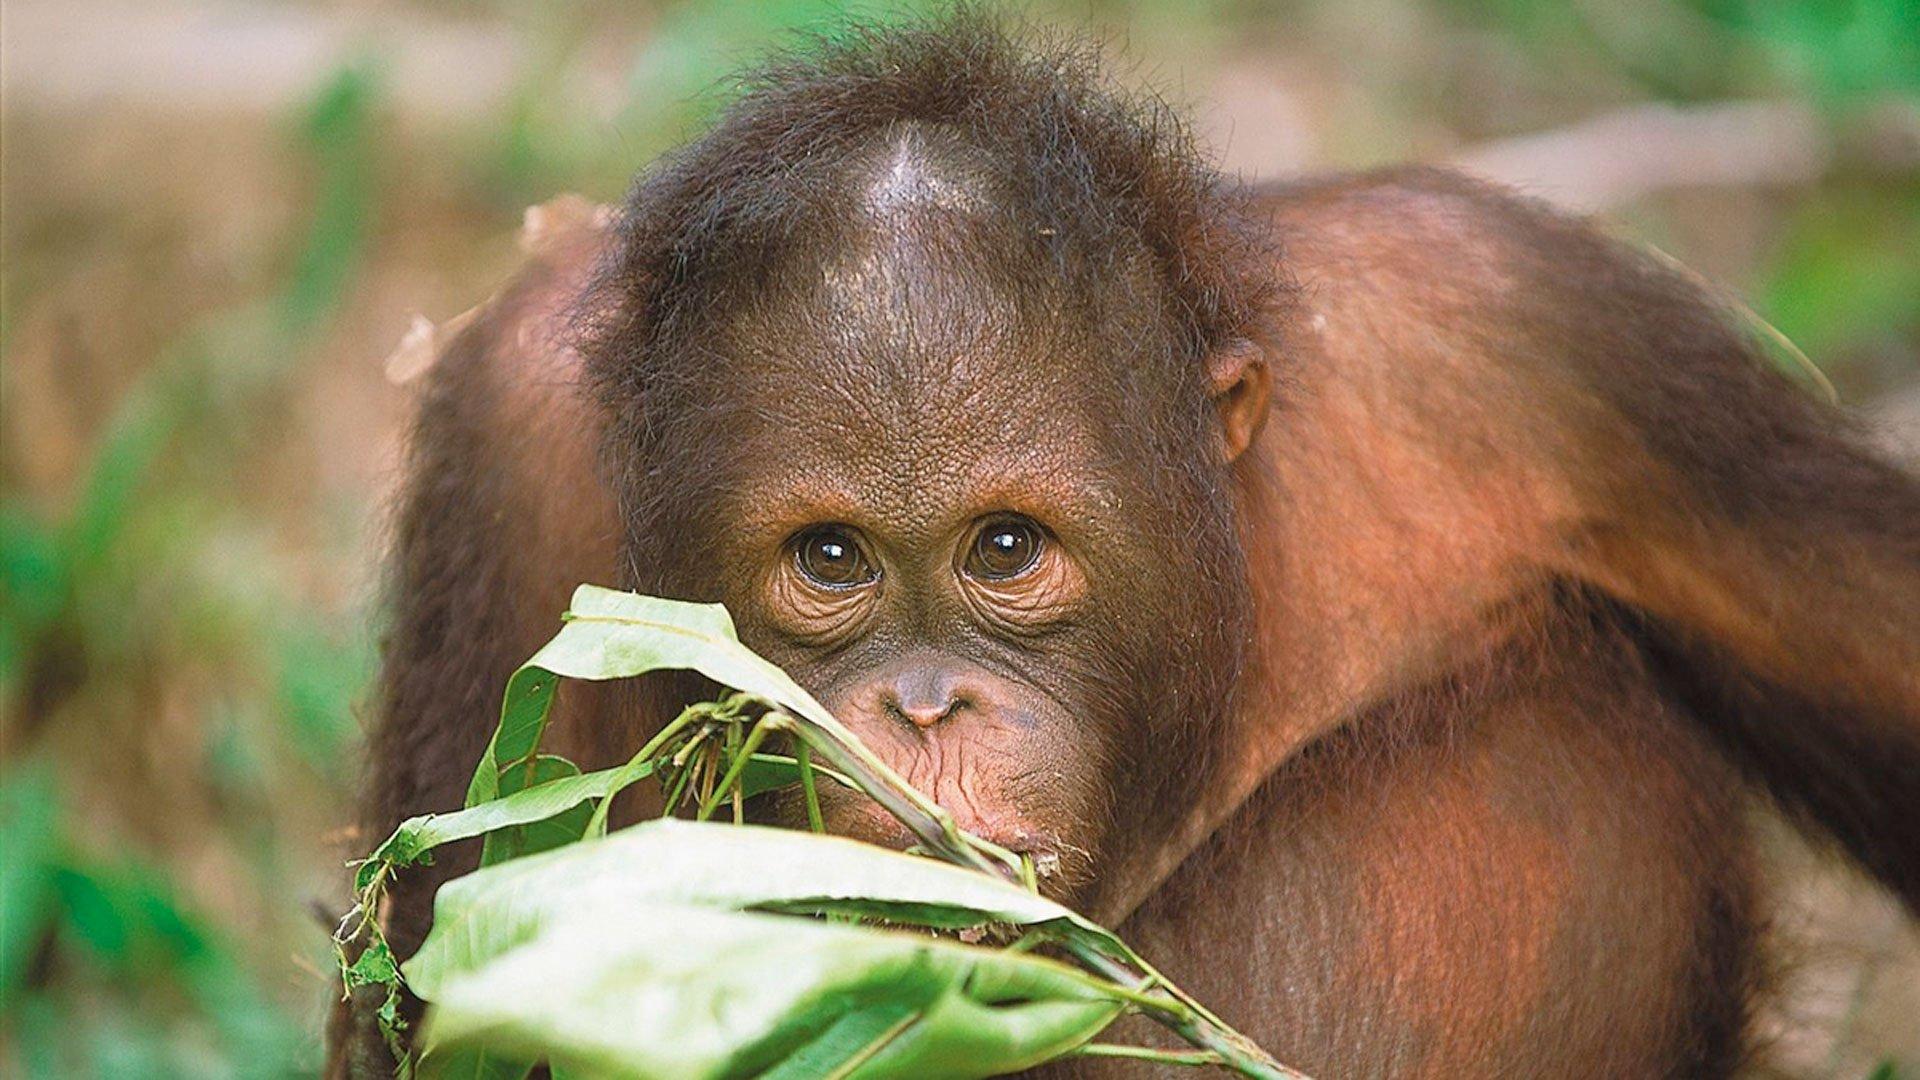 Best place to see wild orangutans in Borneo? - Natural World Safaris